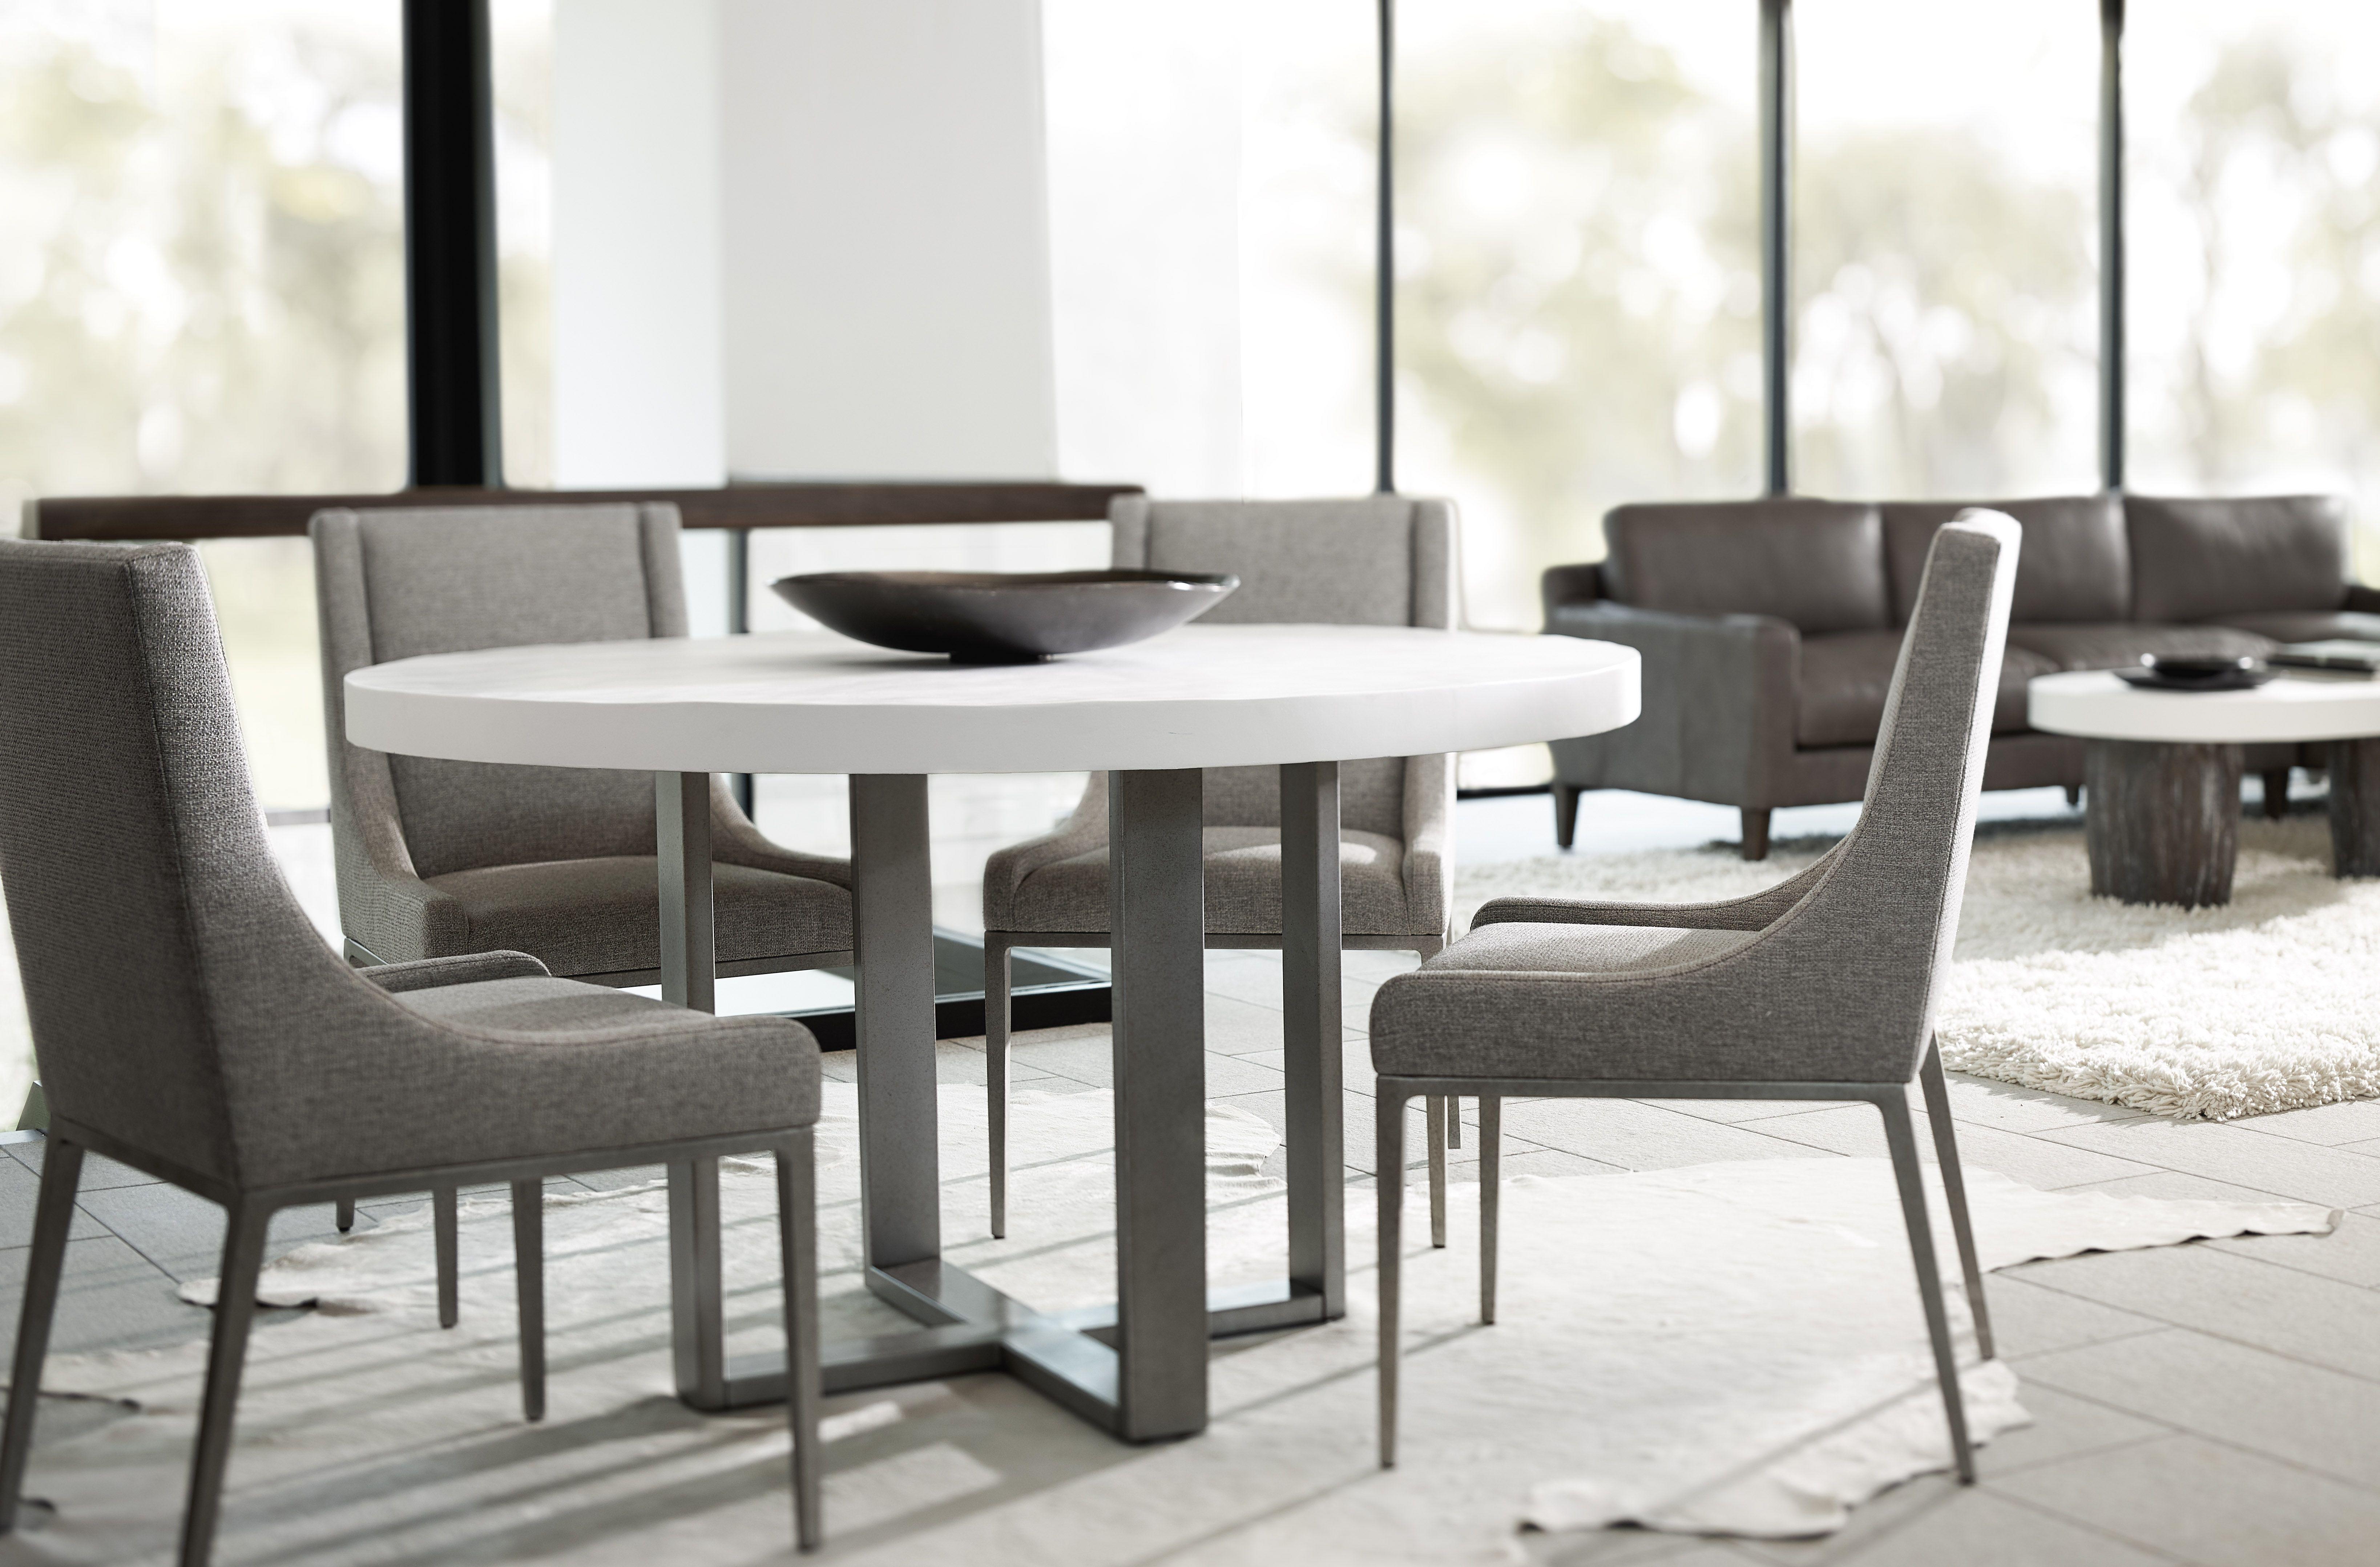 Bernhardt Loft Logan Square in 2020 Round dining table